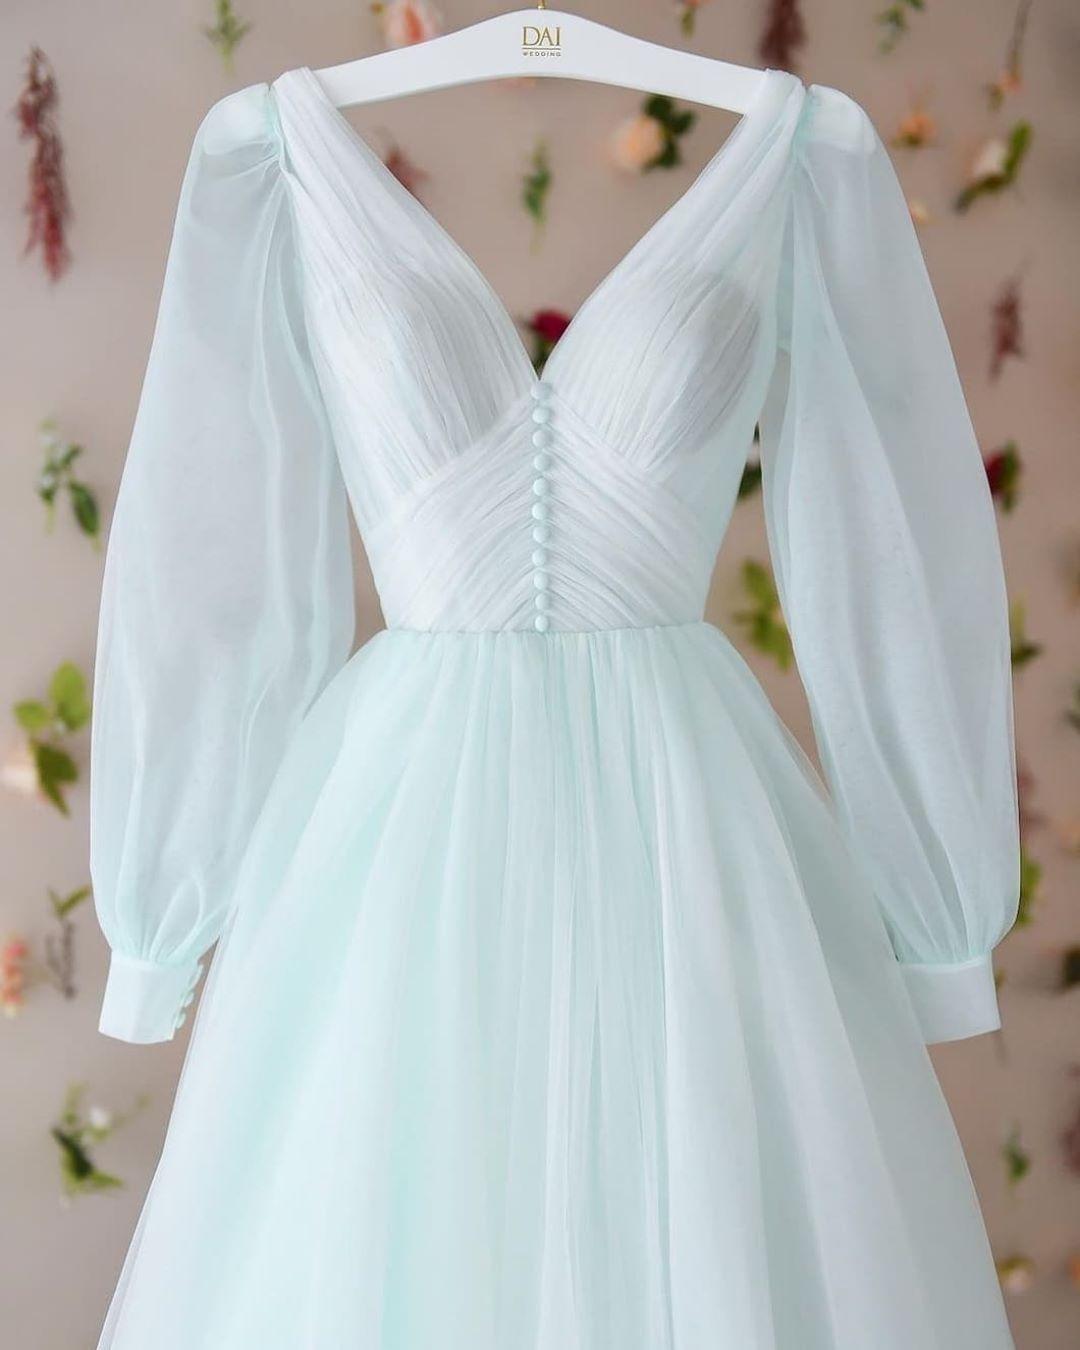 weddingforward 240114489 321326713122127 2318407748063013346 n Alternatives to the LBD (Little Black Dress)